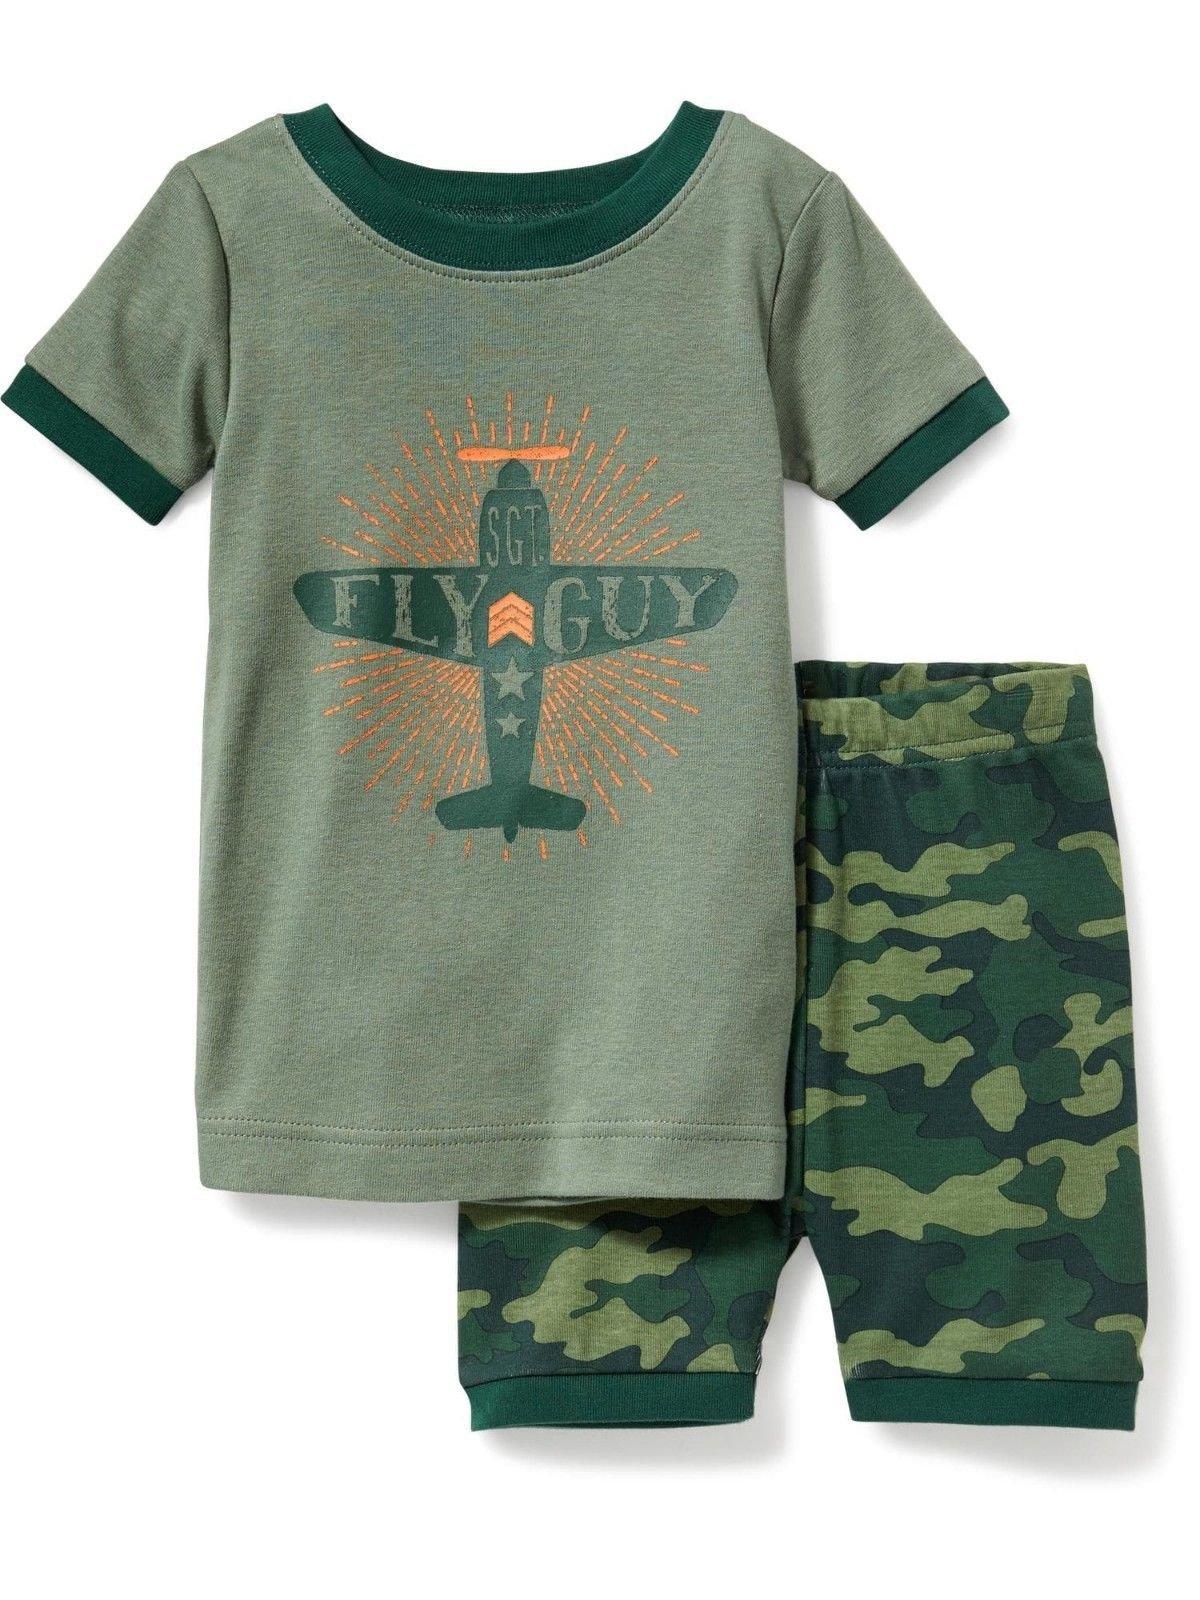 Toddler Boy's 4T Camouflage Airplane Sergeant Pajama Shorts Set